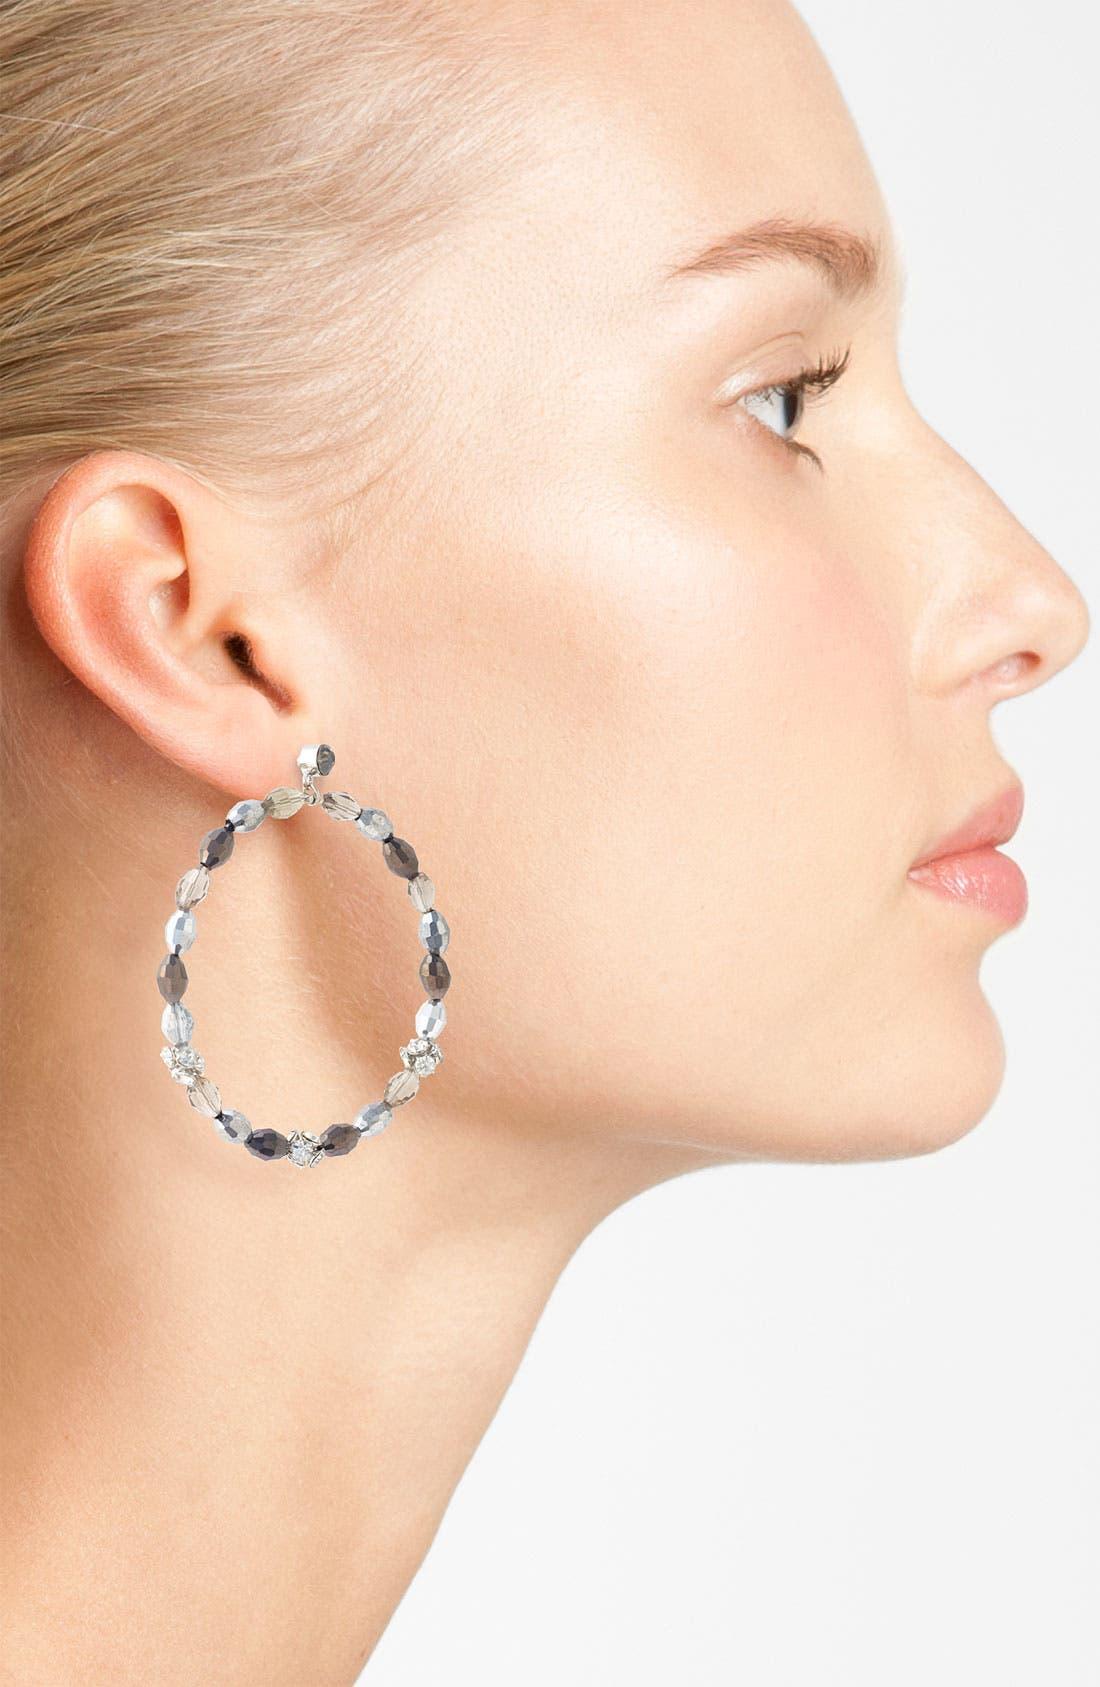 'Mardi Gras' Frontal Hoop Earrings,                             Alternate thumbnail 2, color,                             020